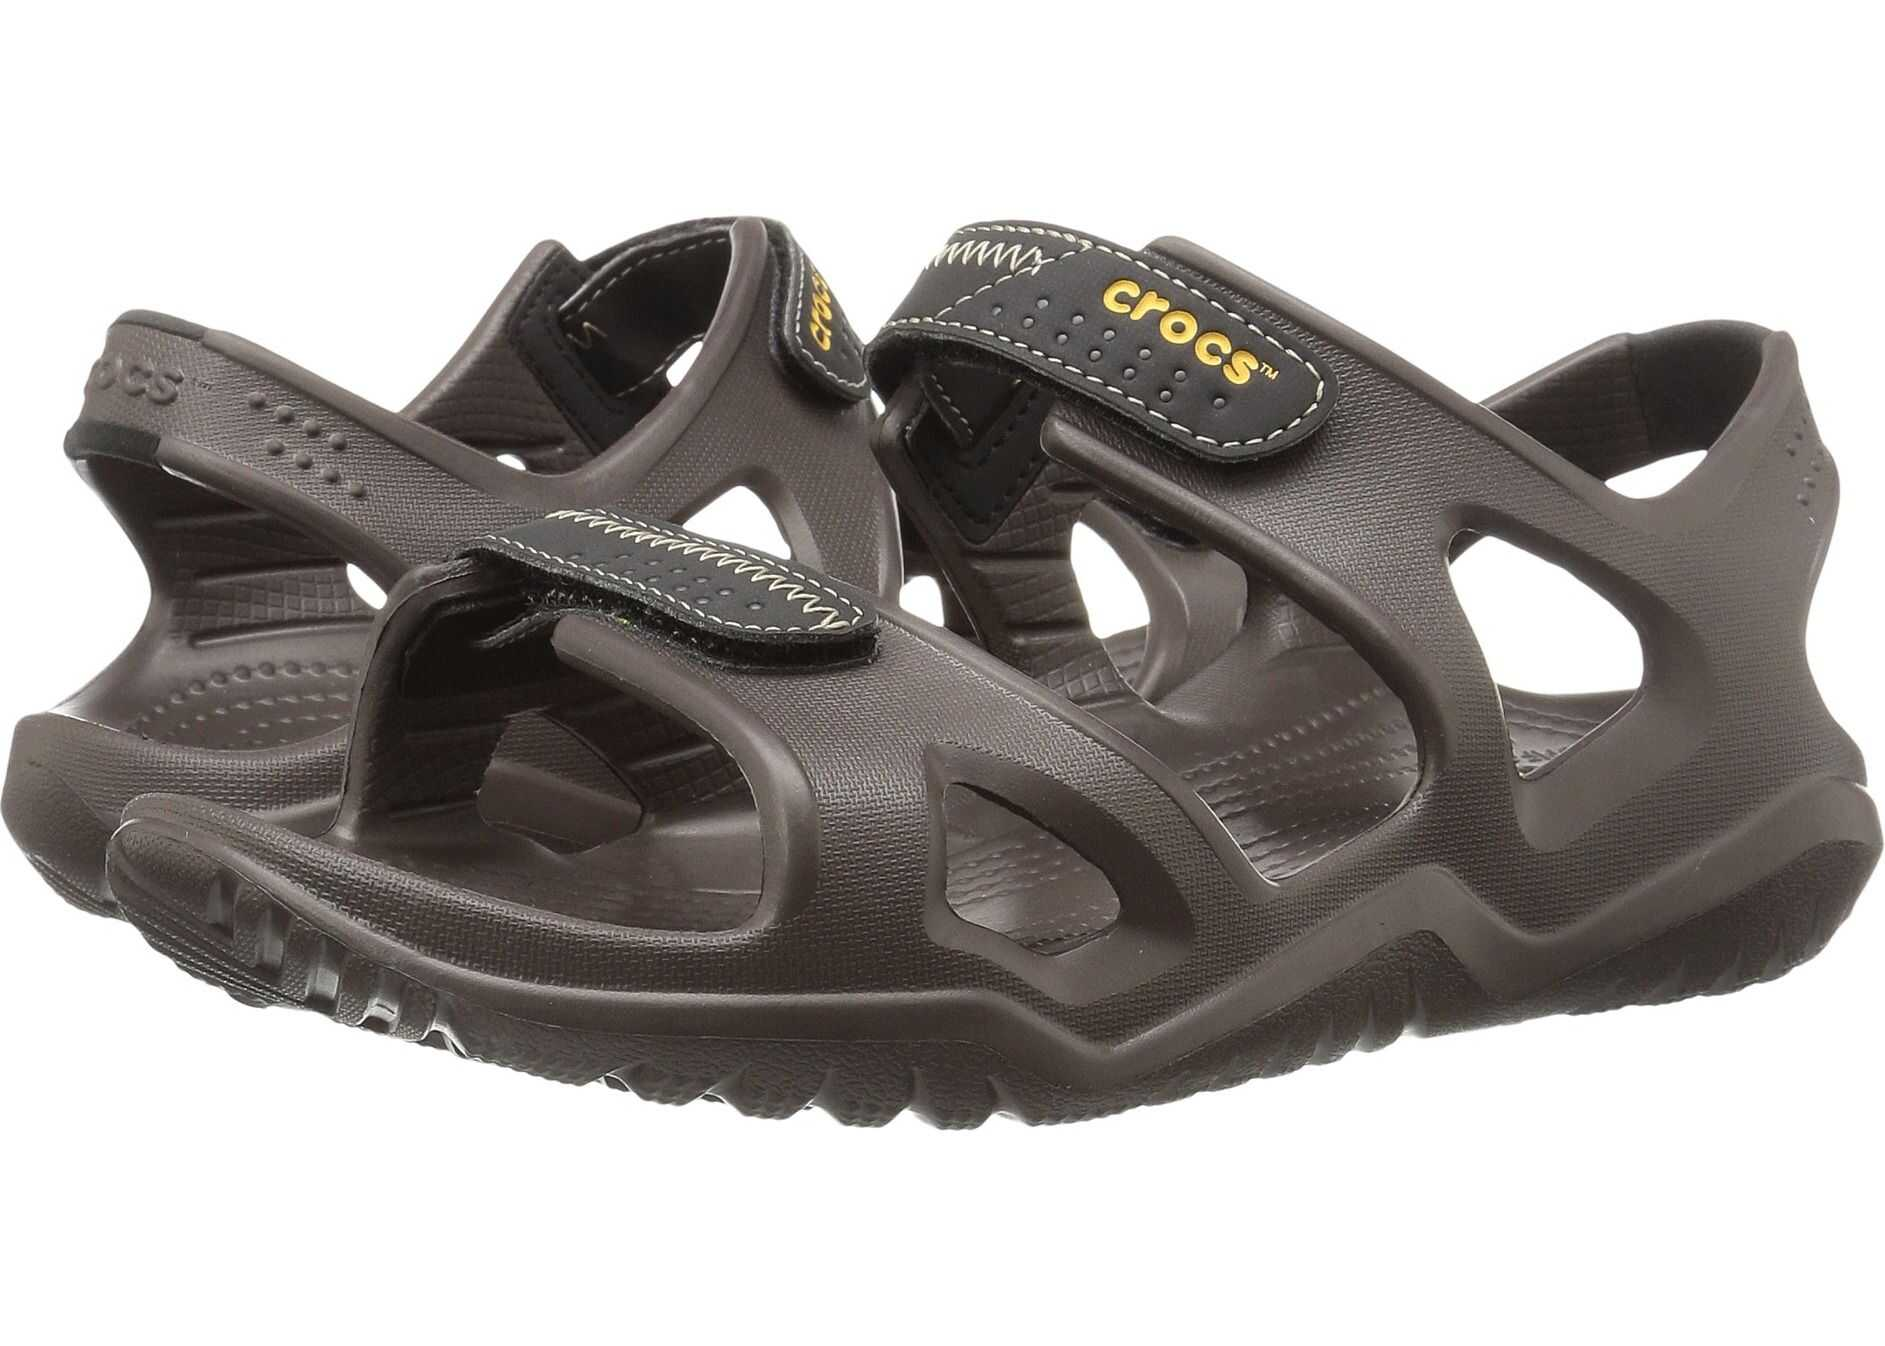 Crocs Swiftwater River Sandal Espresso/Black